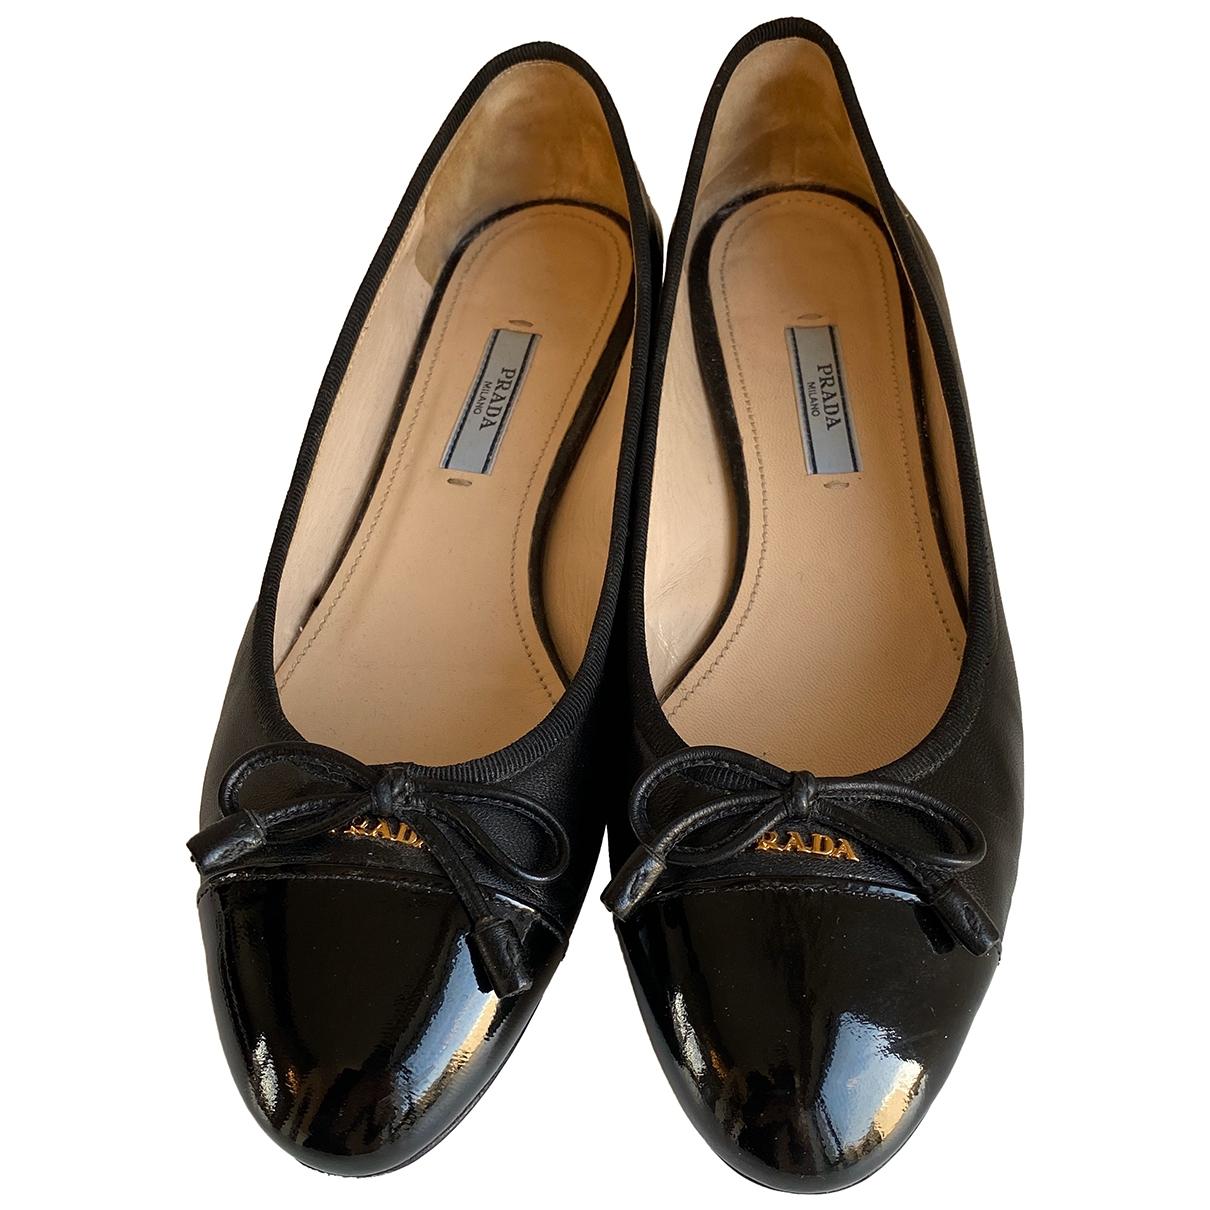 Prada \N Black Patent leather Ballet flats for Women 37 EU